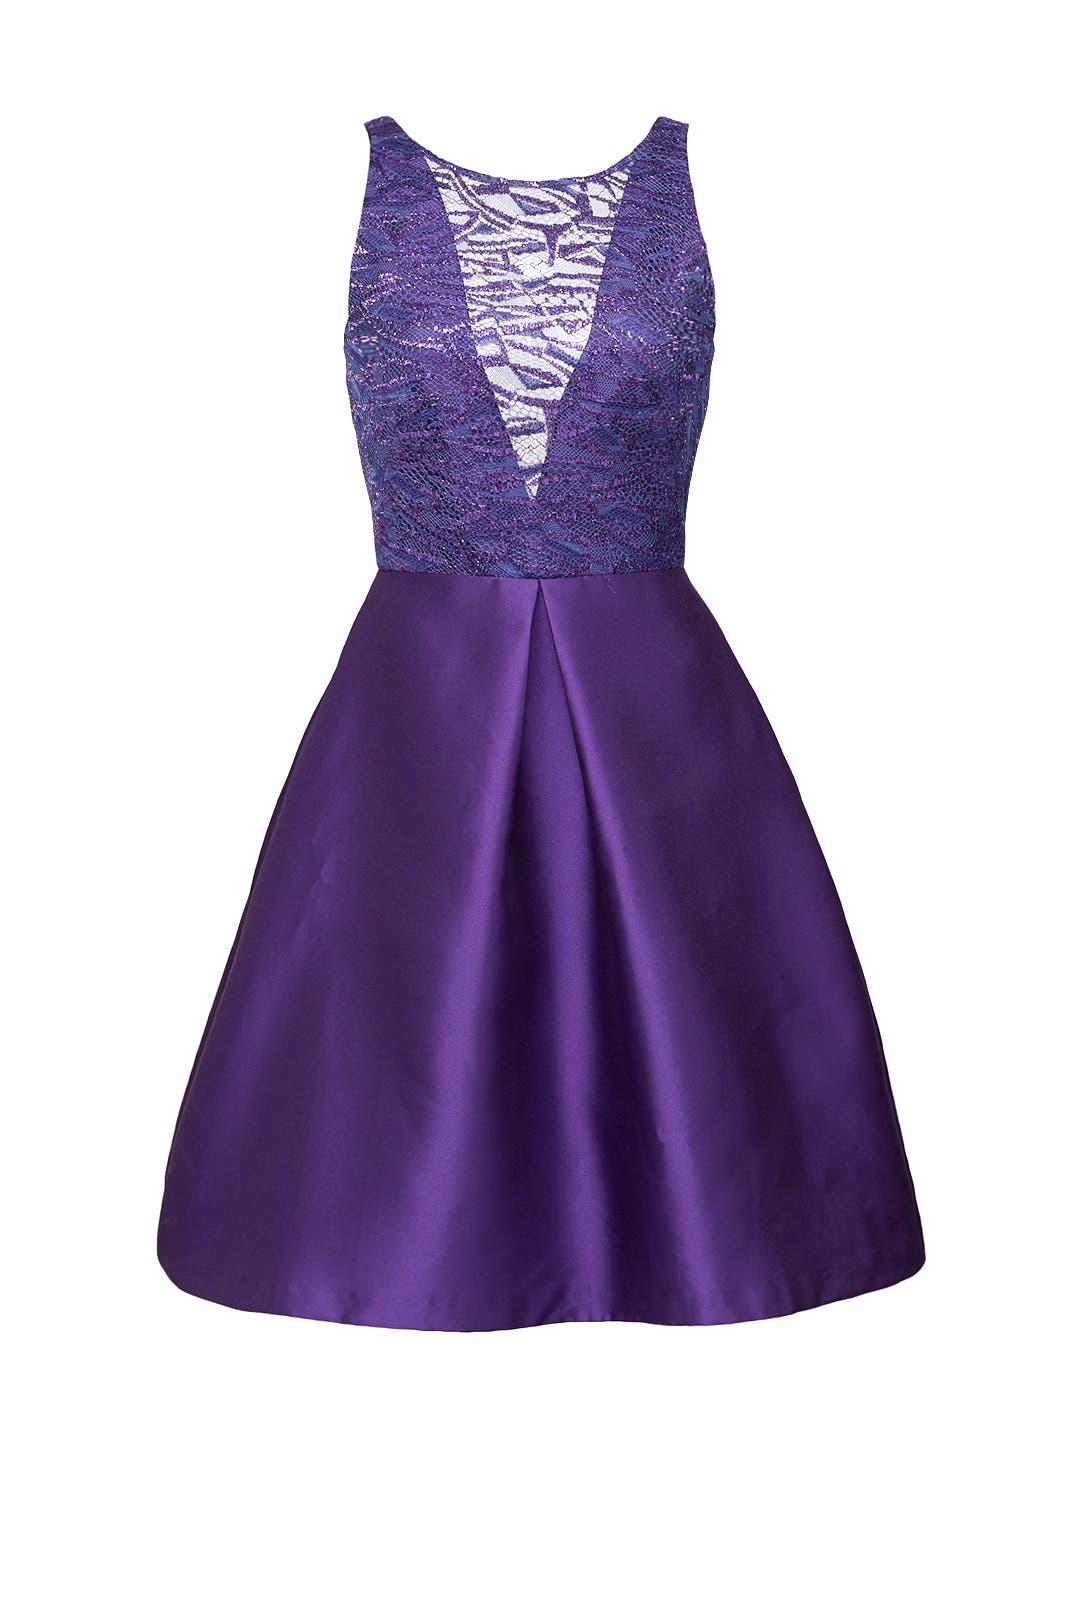 Purple Mikado Dress by ML Monique Lhuillier for $115 | Rent the Runway